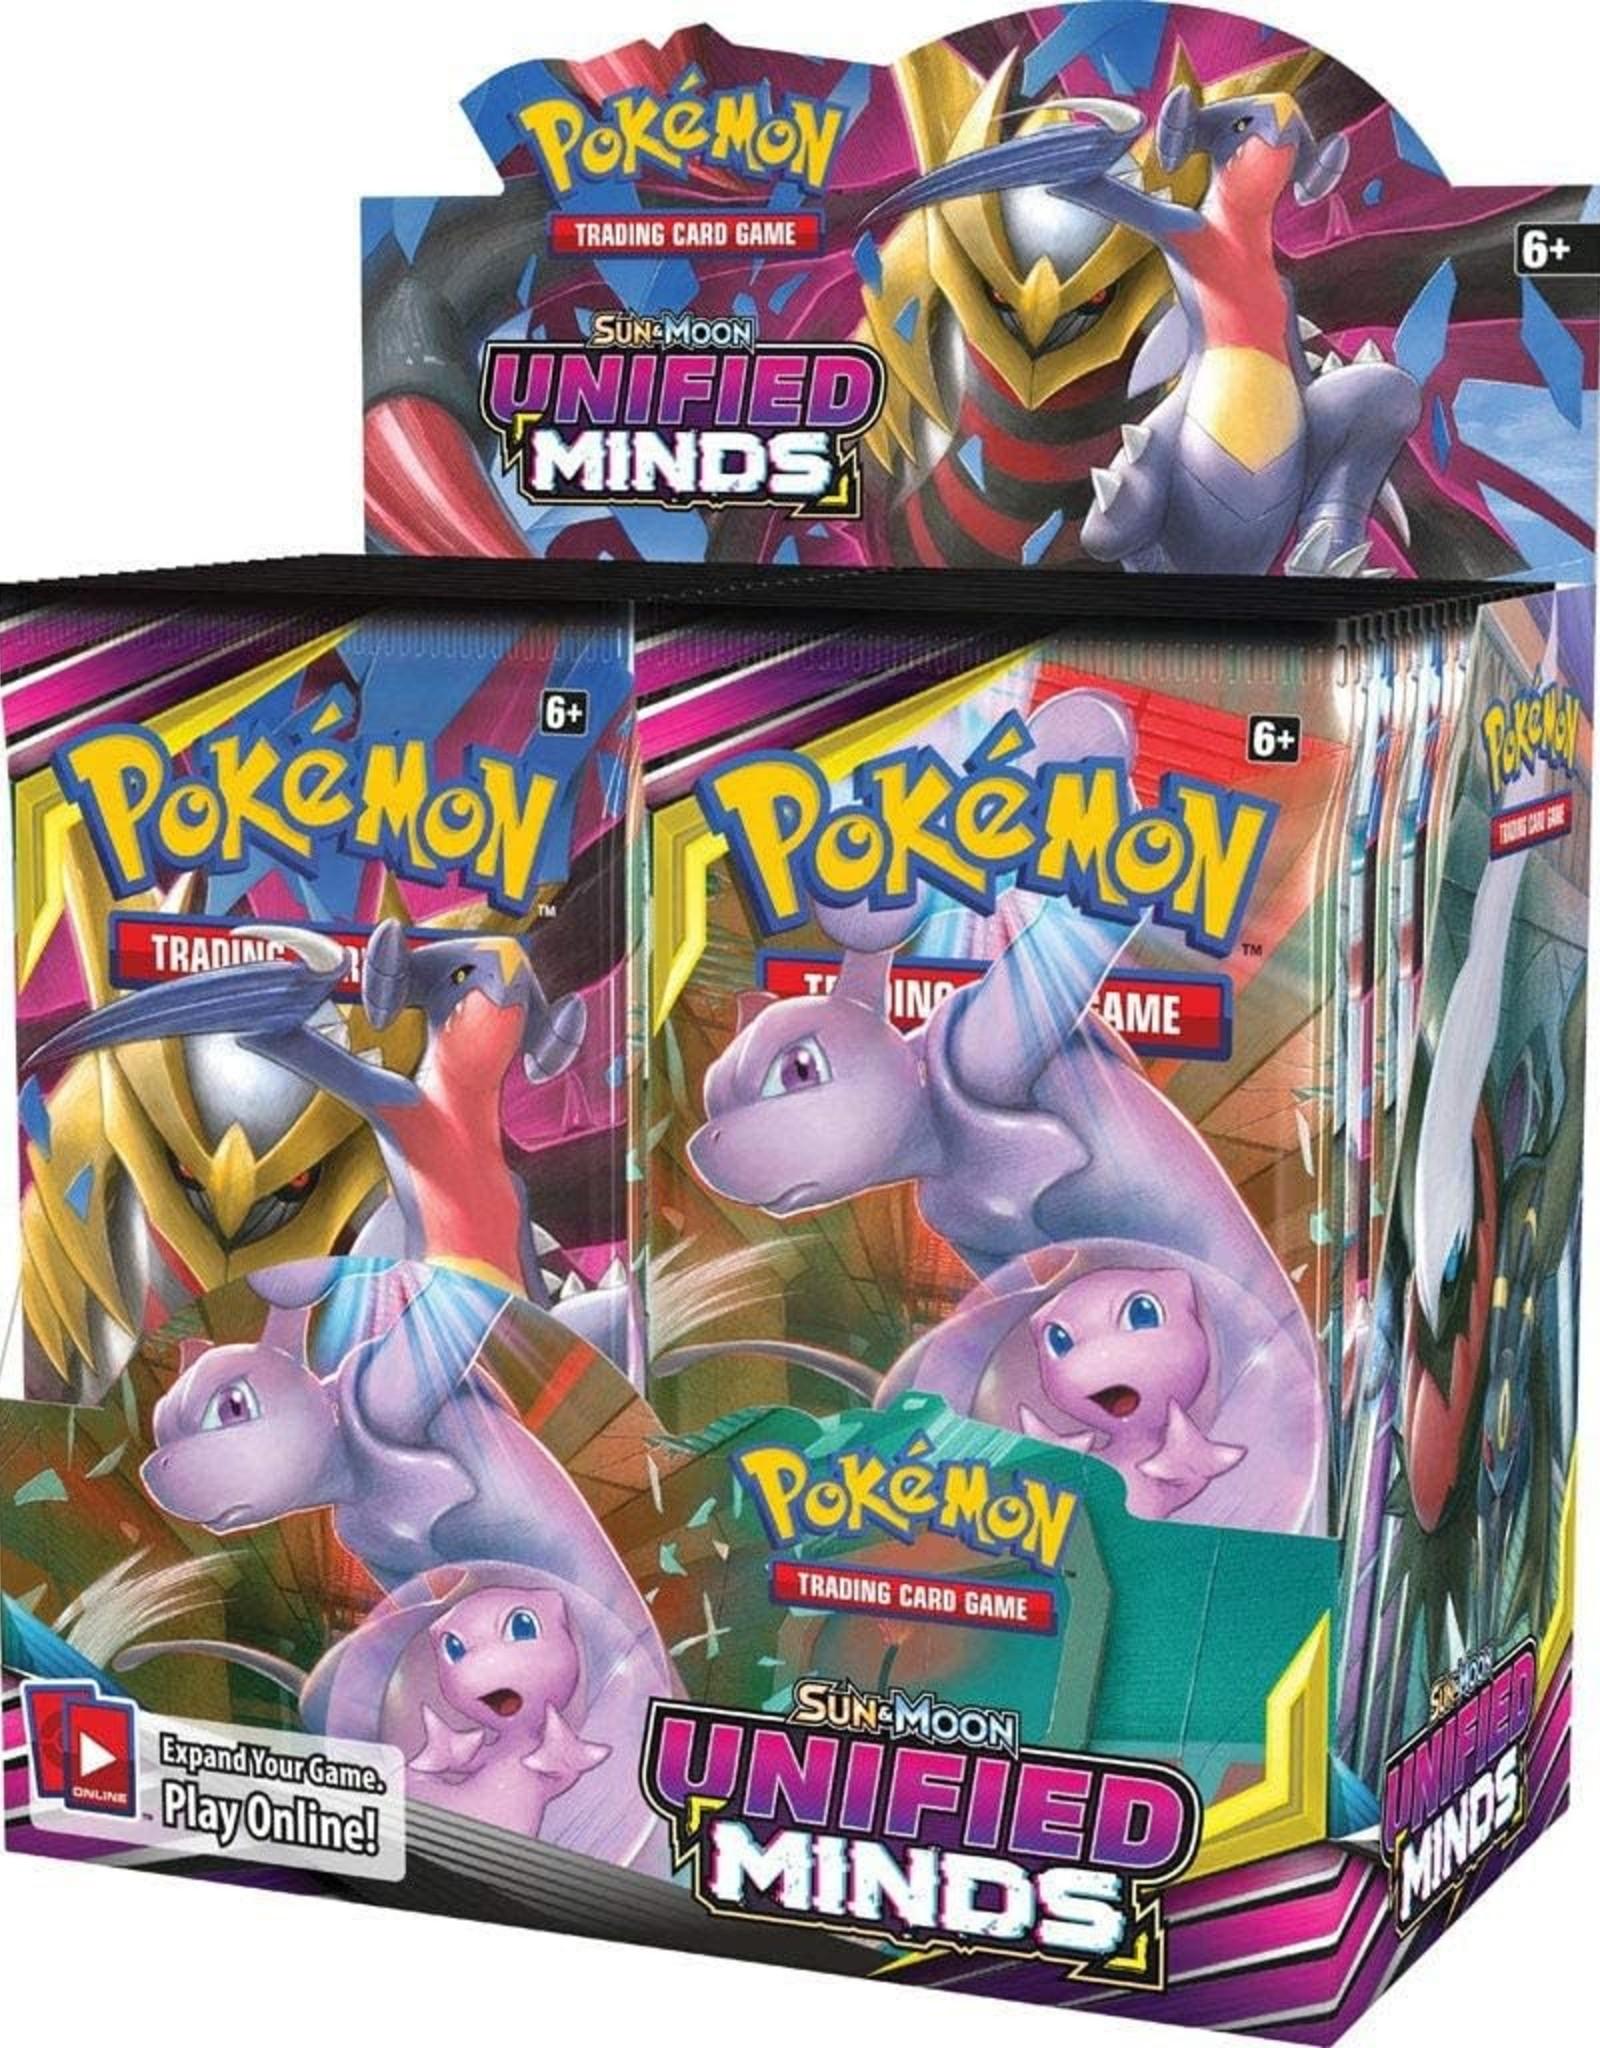 Pokemon Unified Minds Booster Box